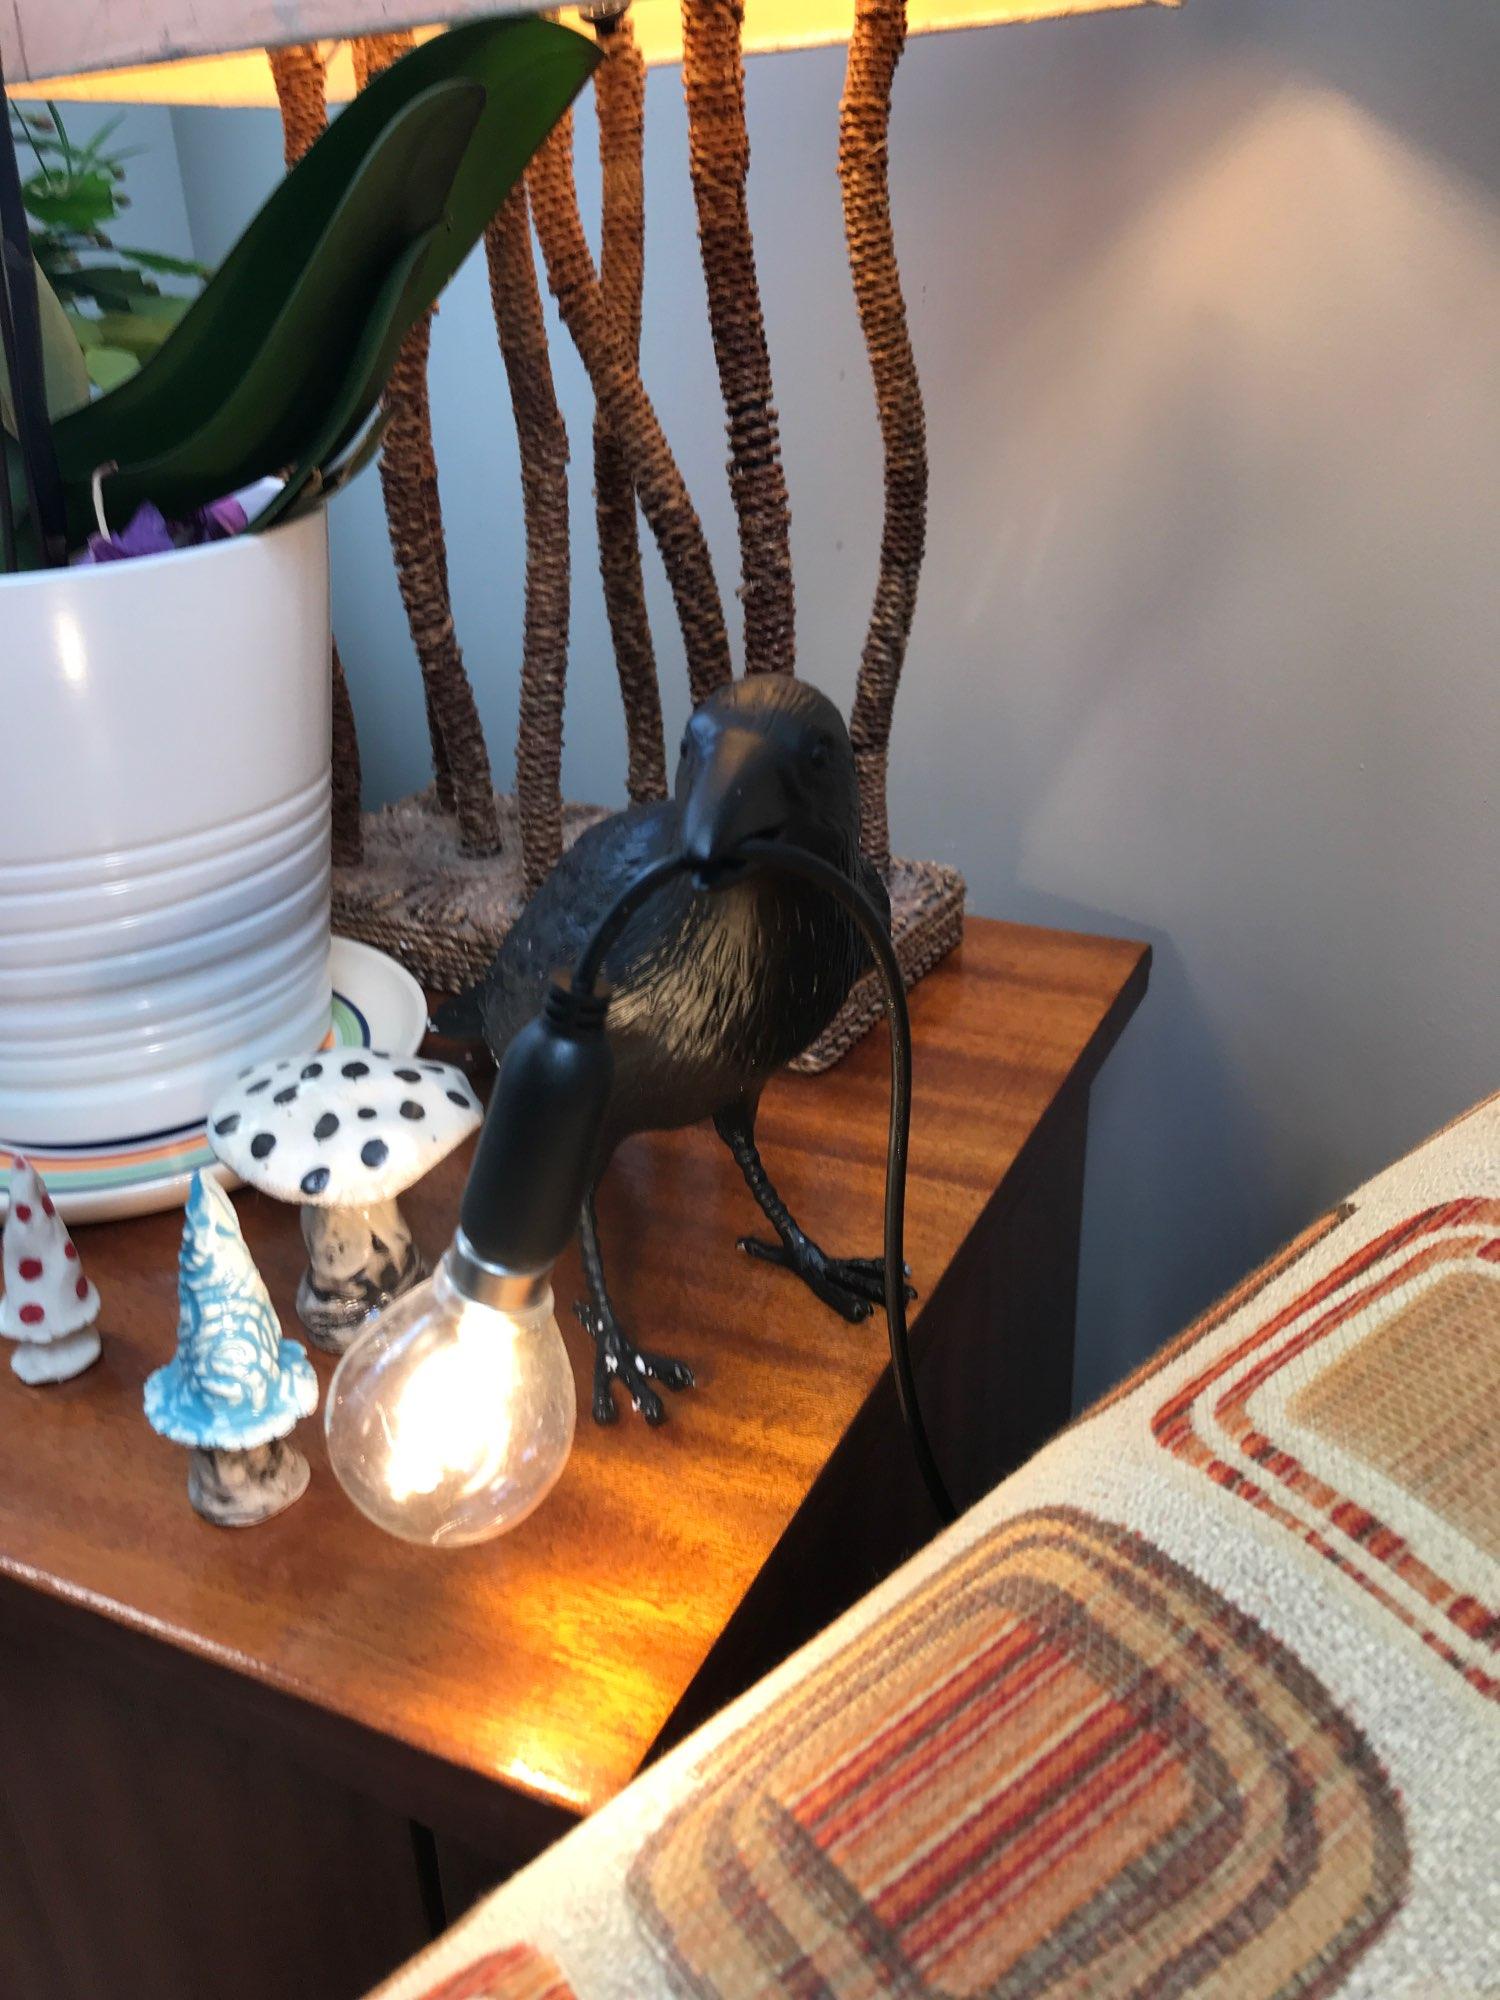 Raven Light - luxxllyhome photo review